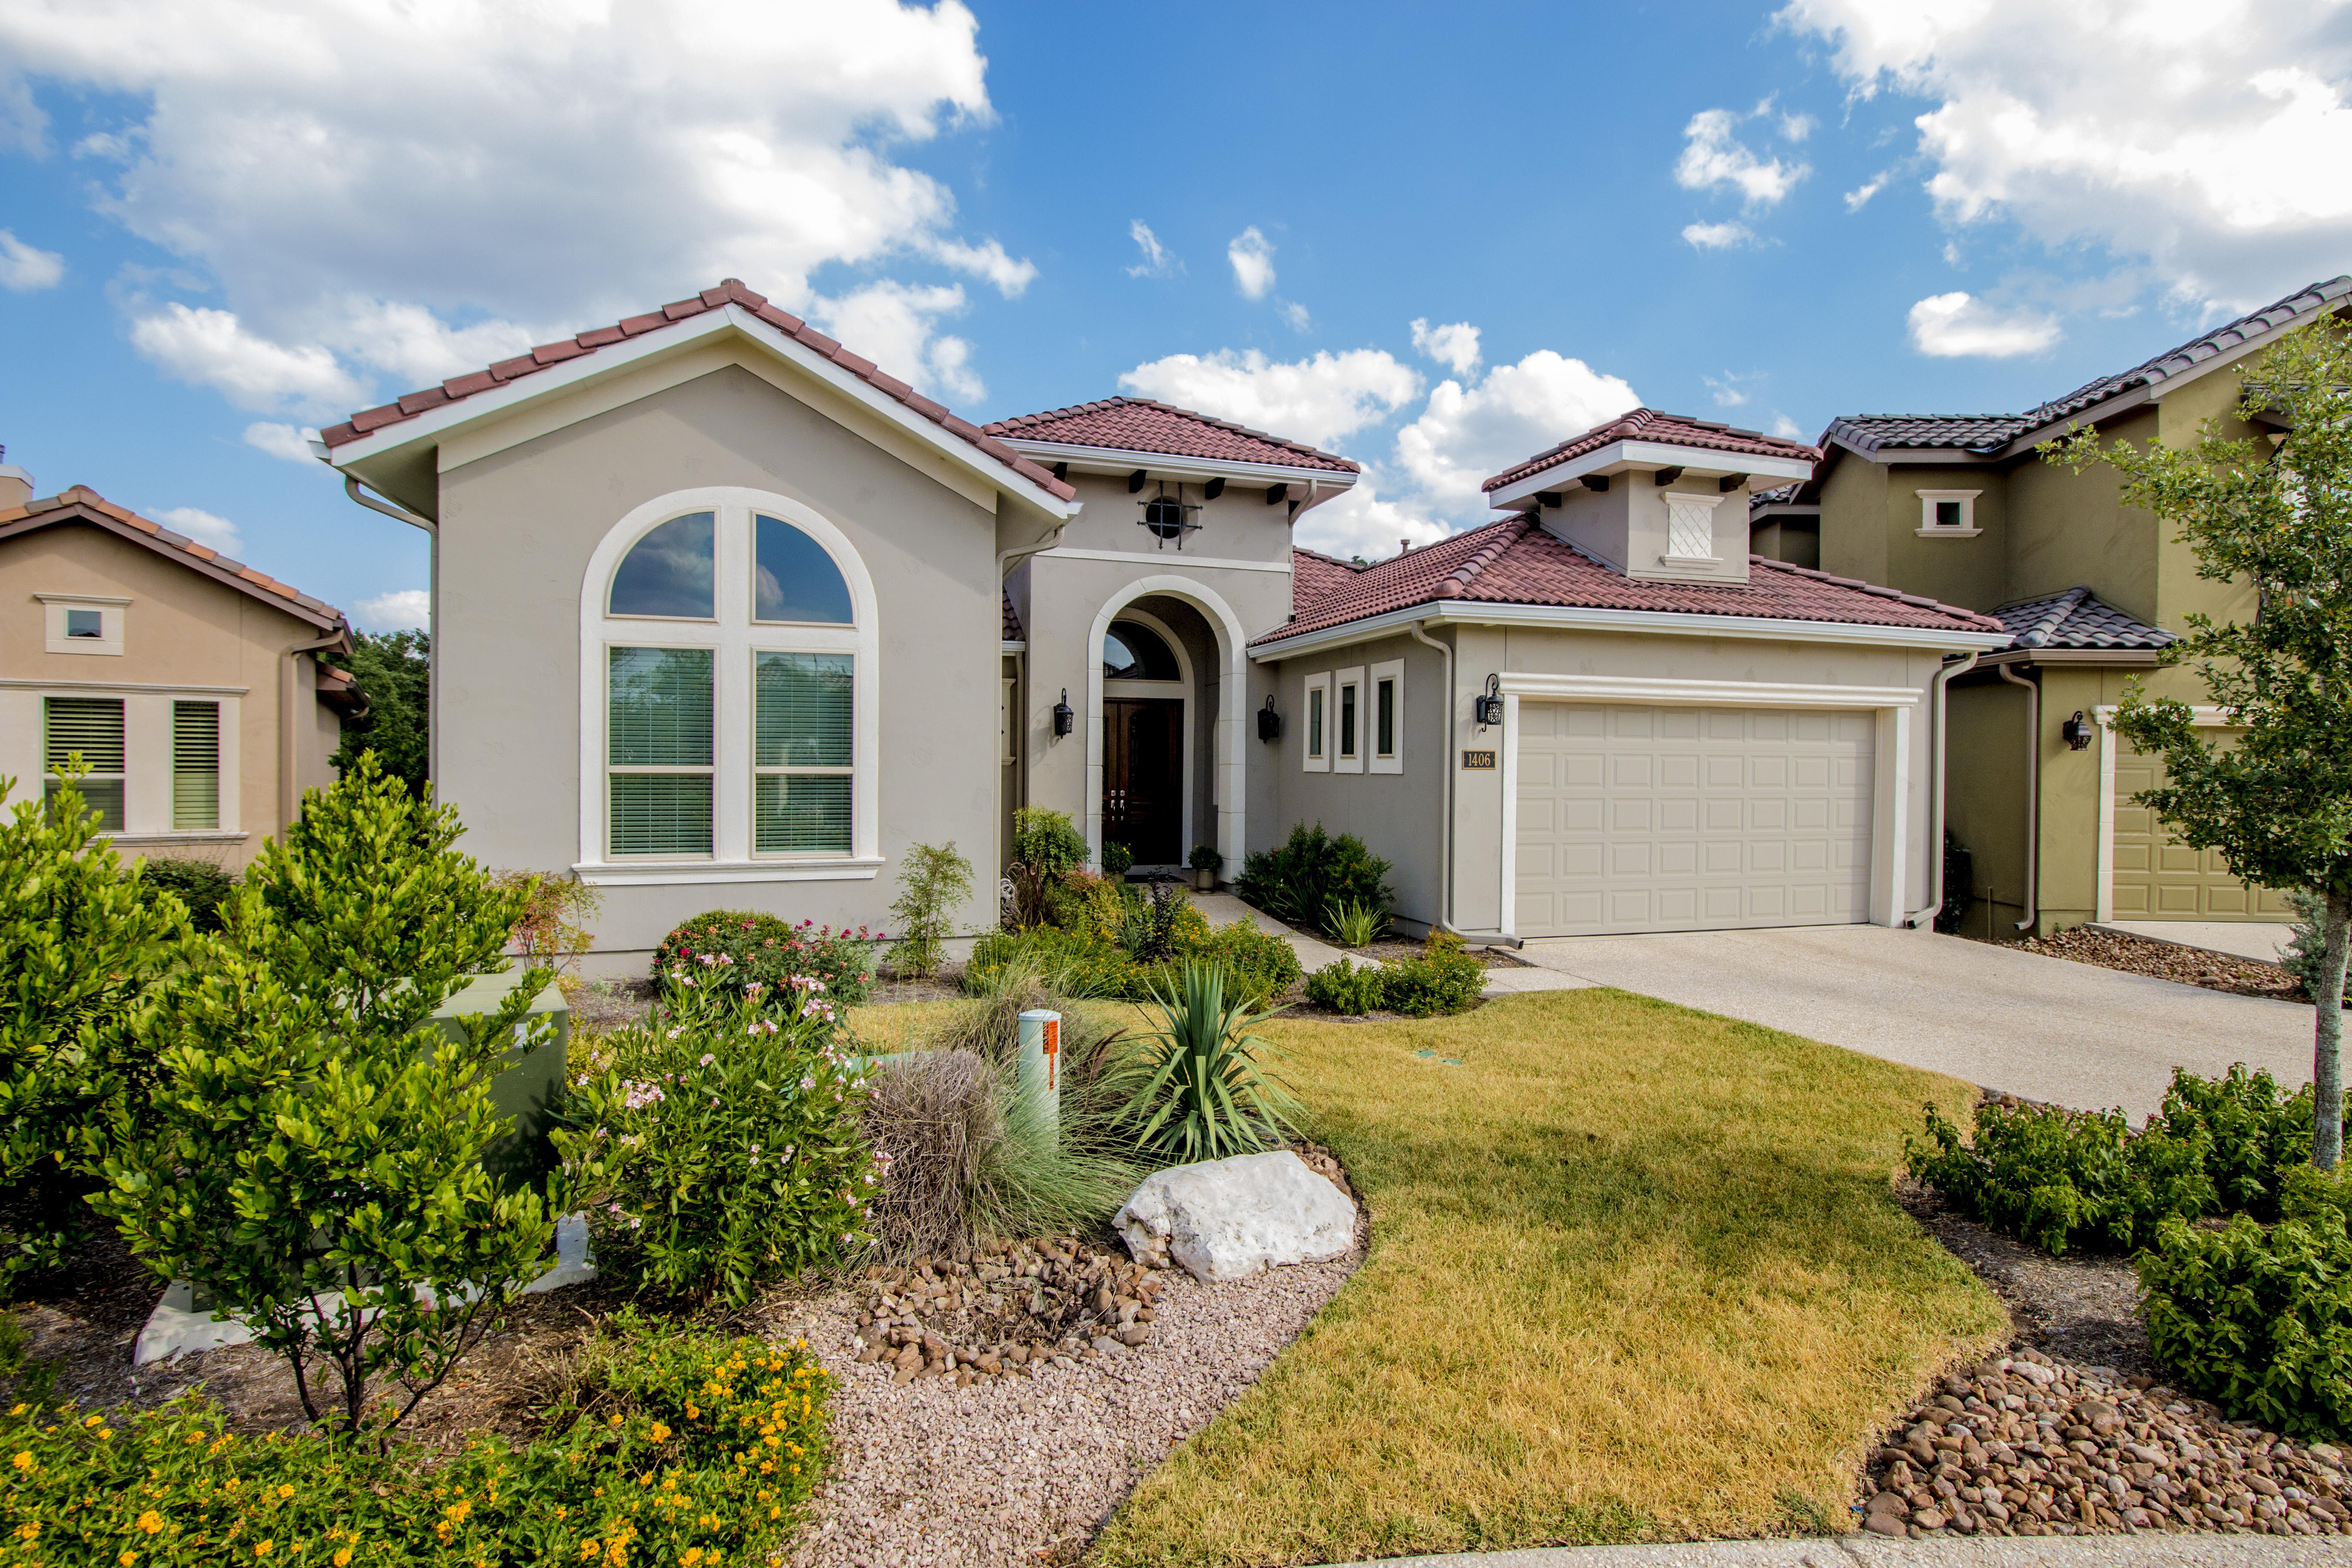 Homes for sale in Stone Oak, TX - San Antonio Real Estate | HomeCity